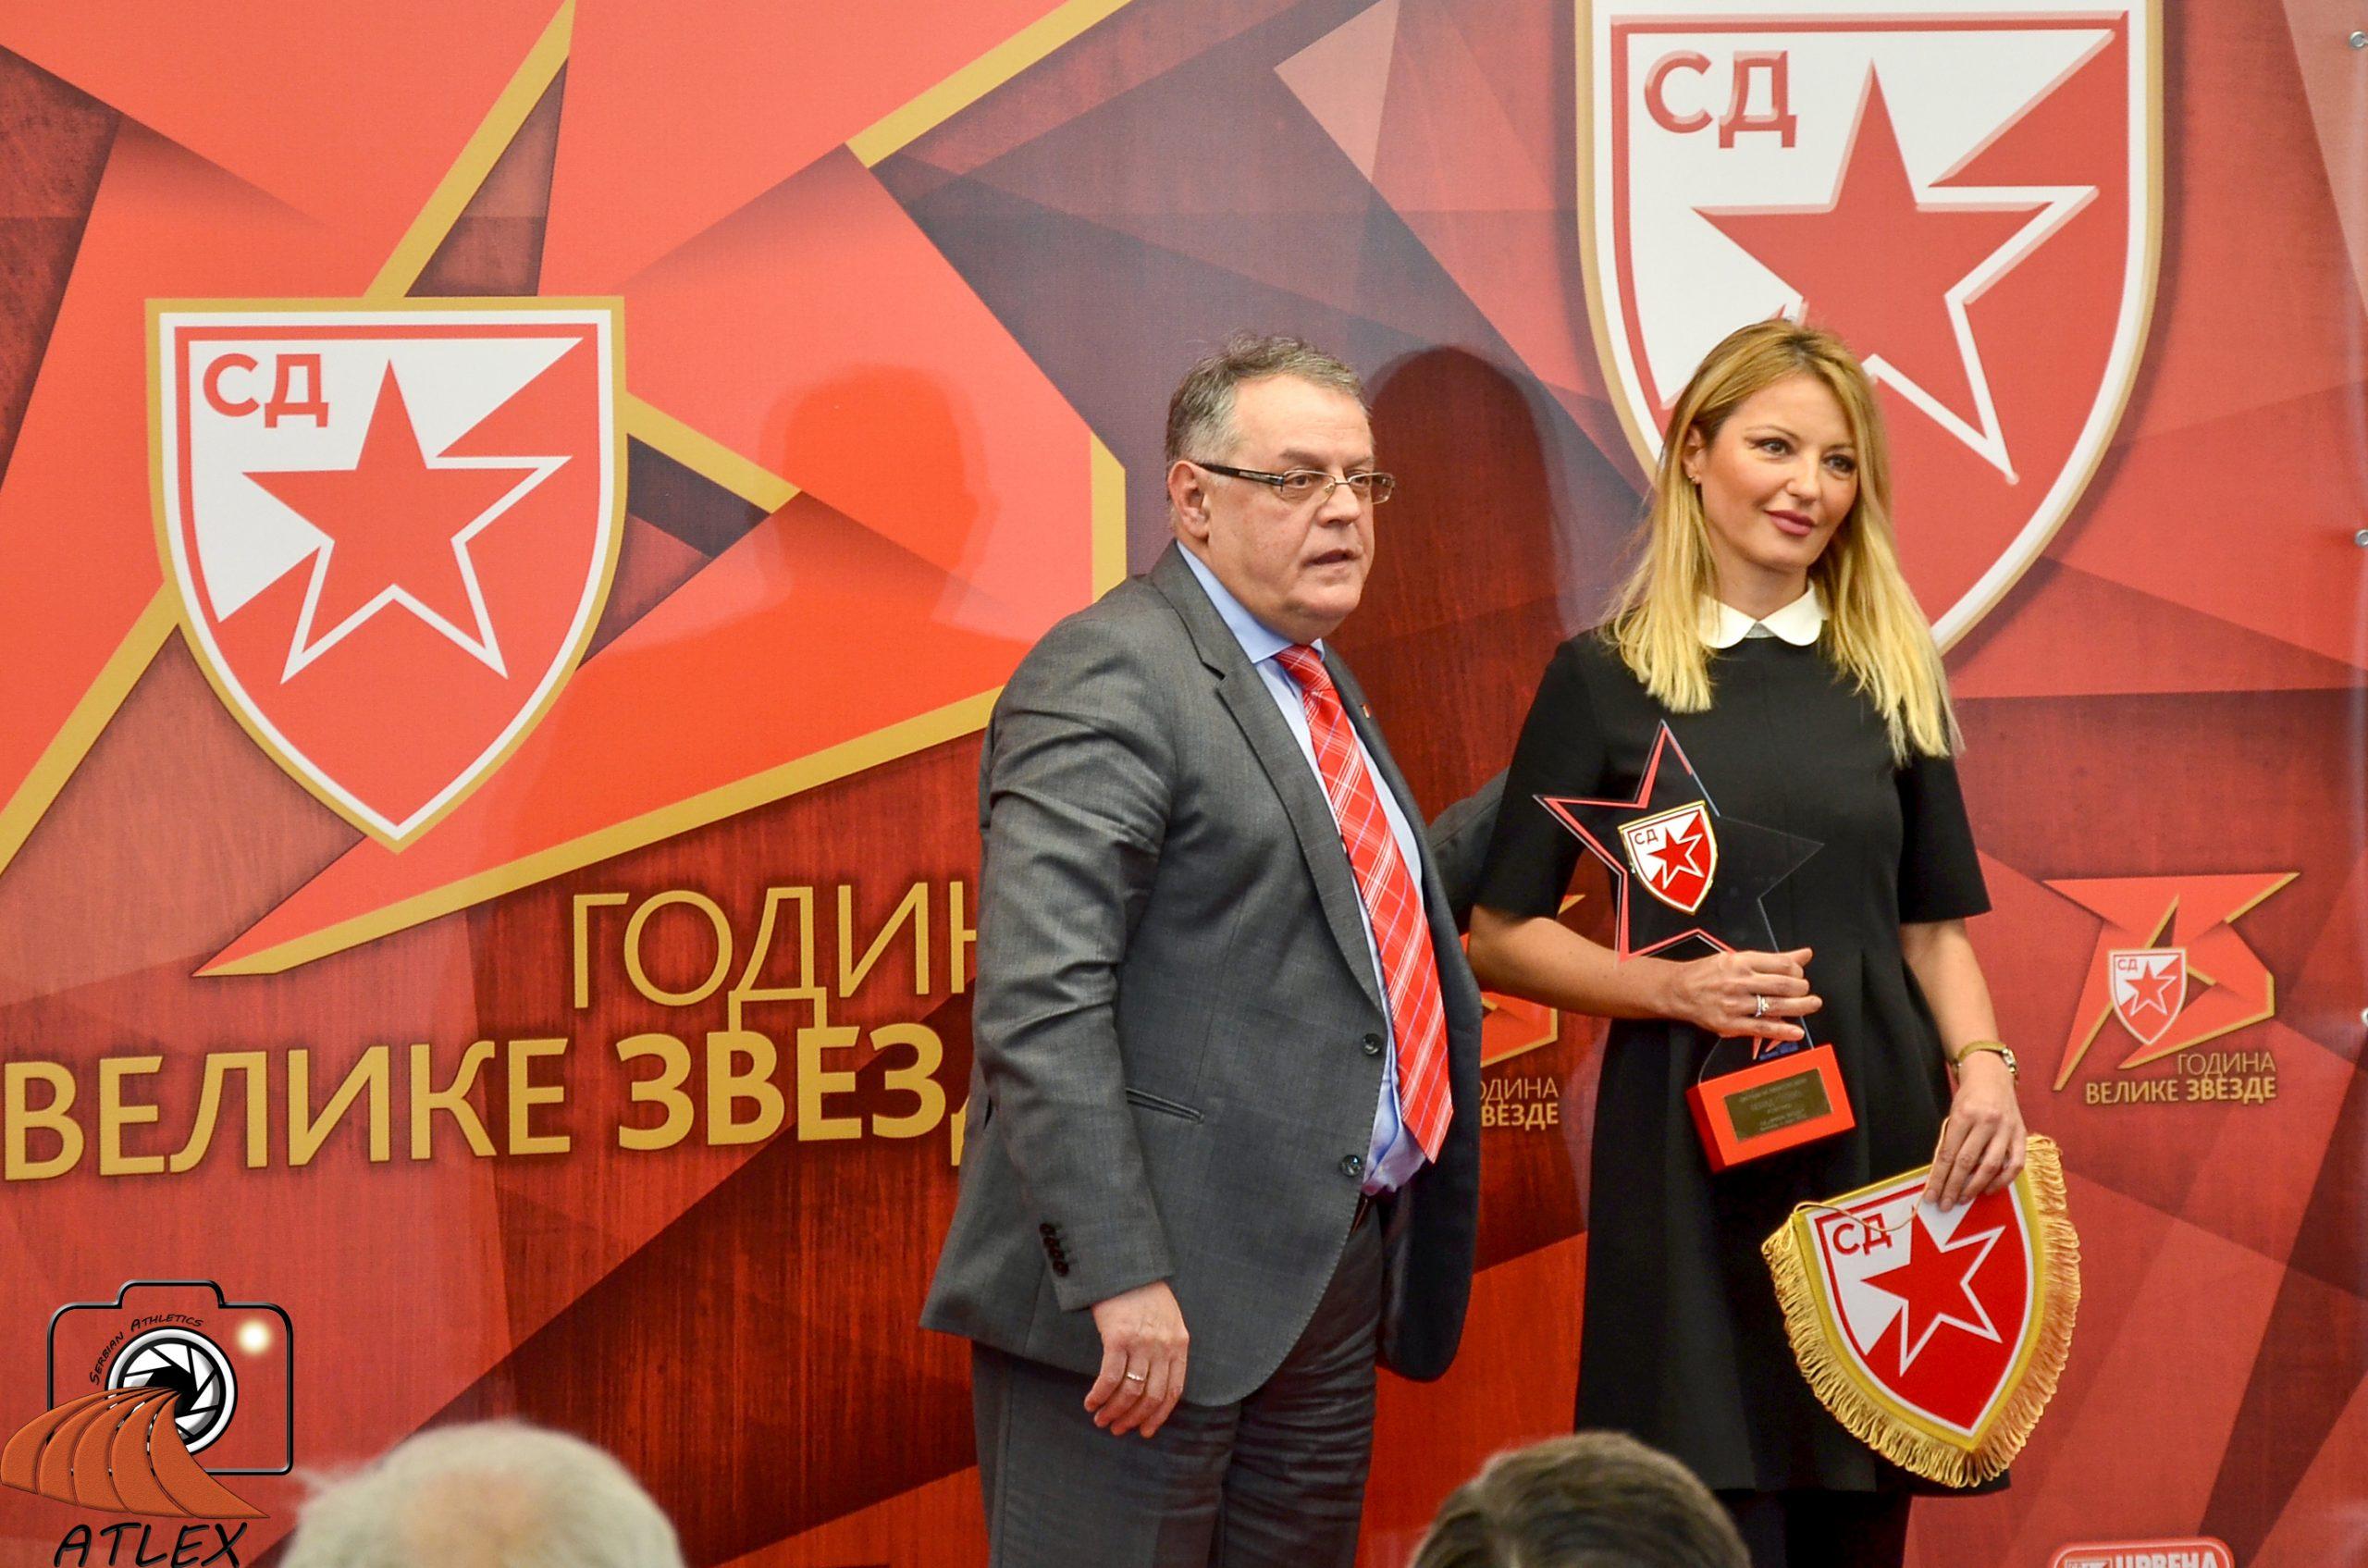 Specijalno priznanje za Nenada Stekića, 75. rođendan SD Crvena zvezda